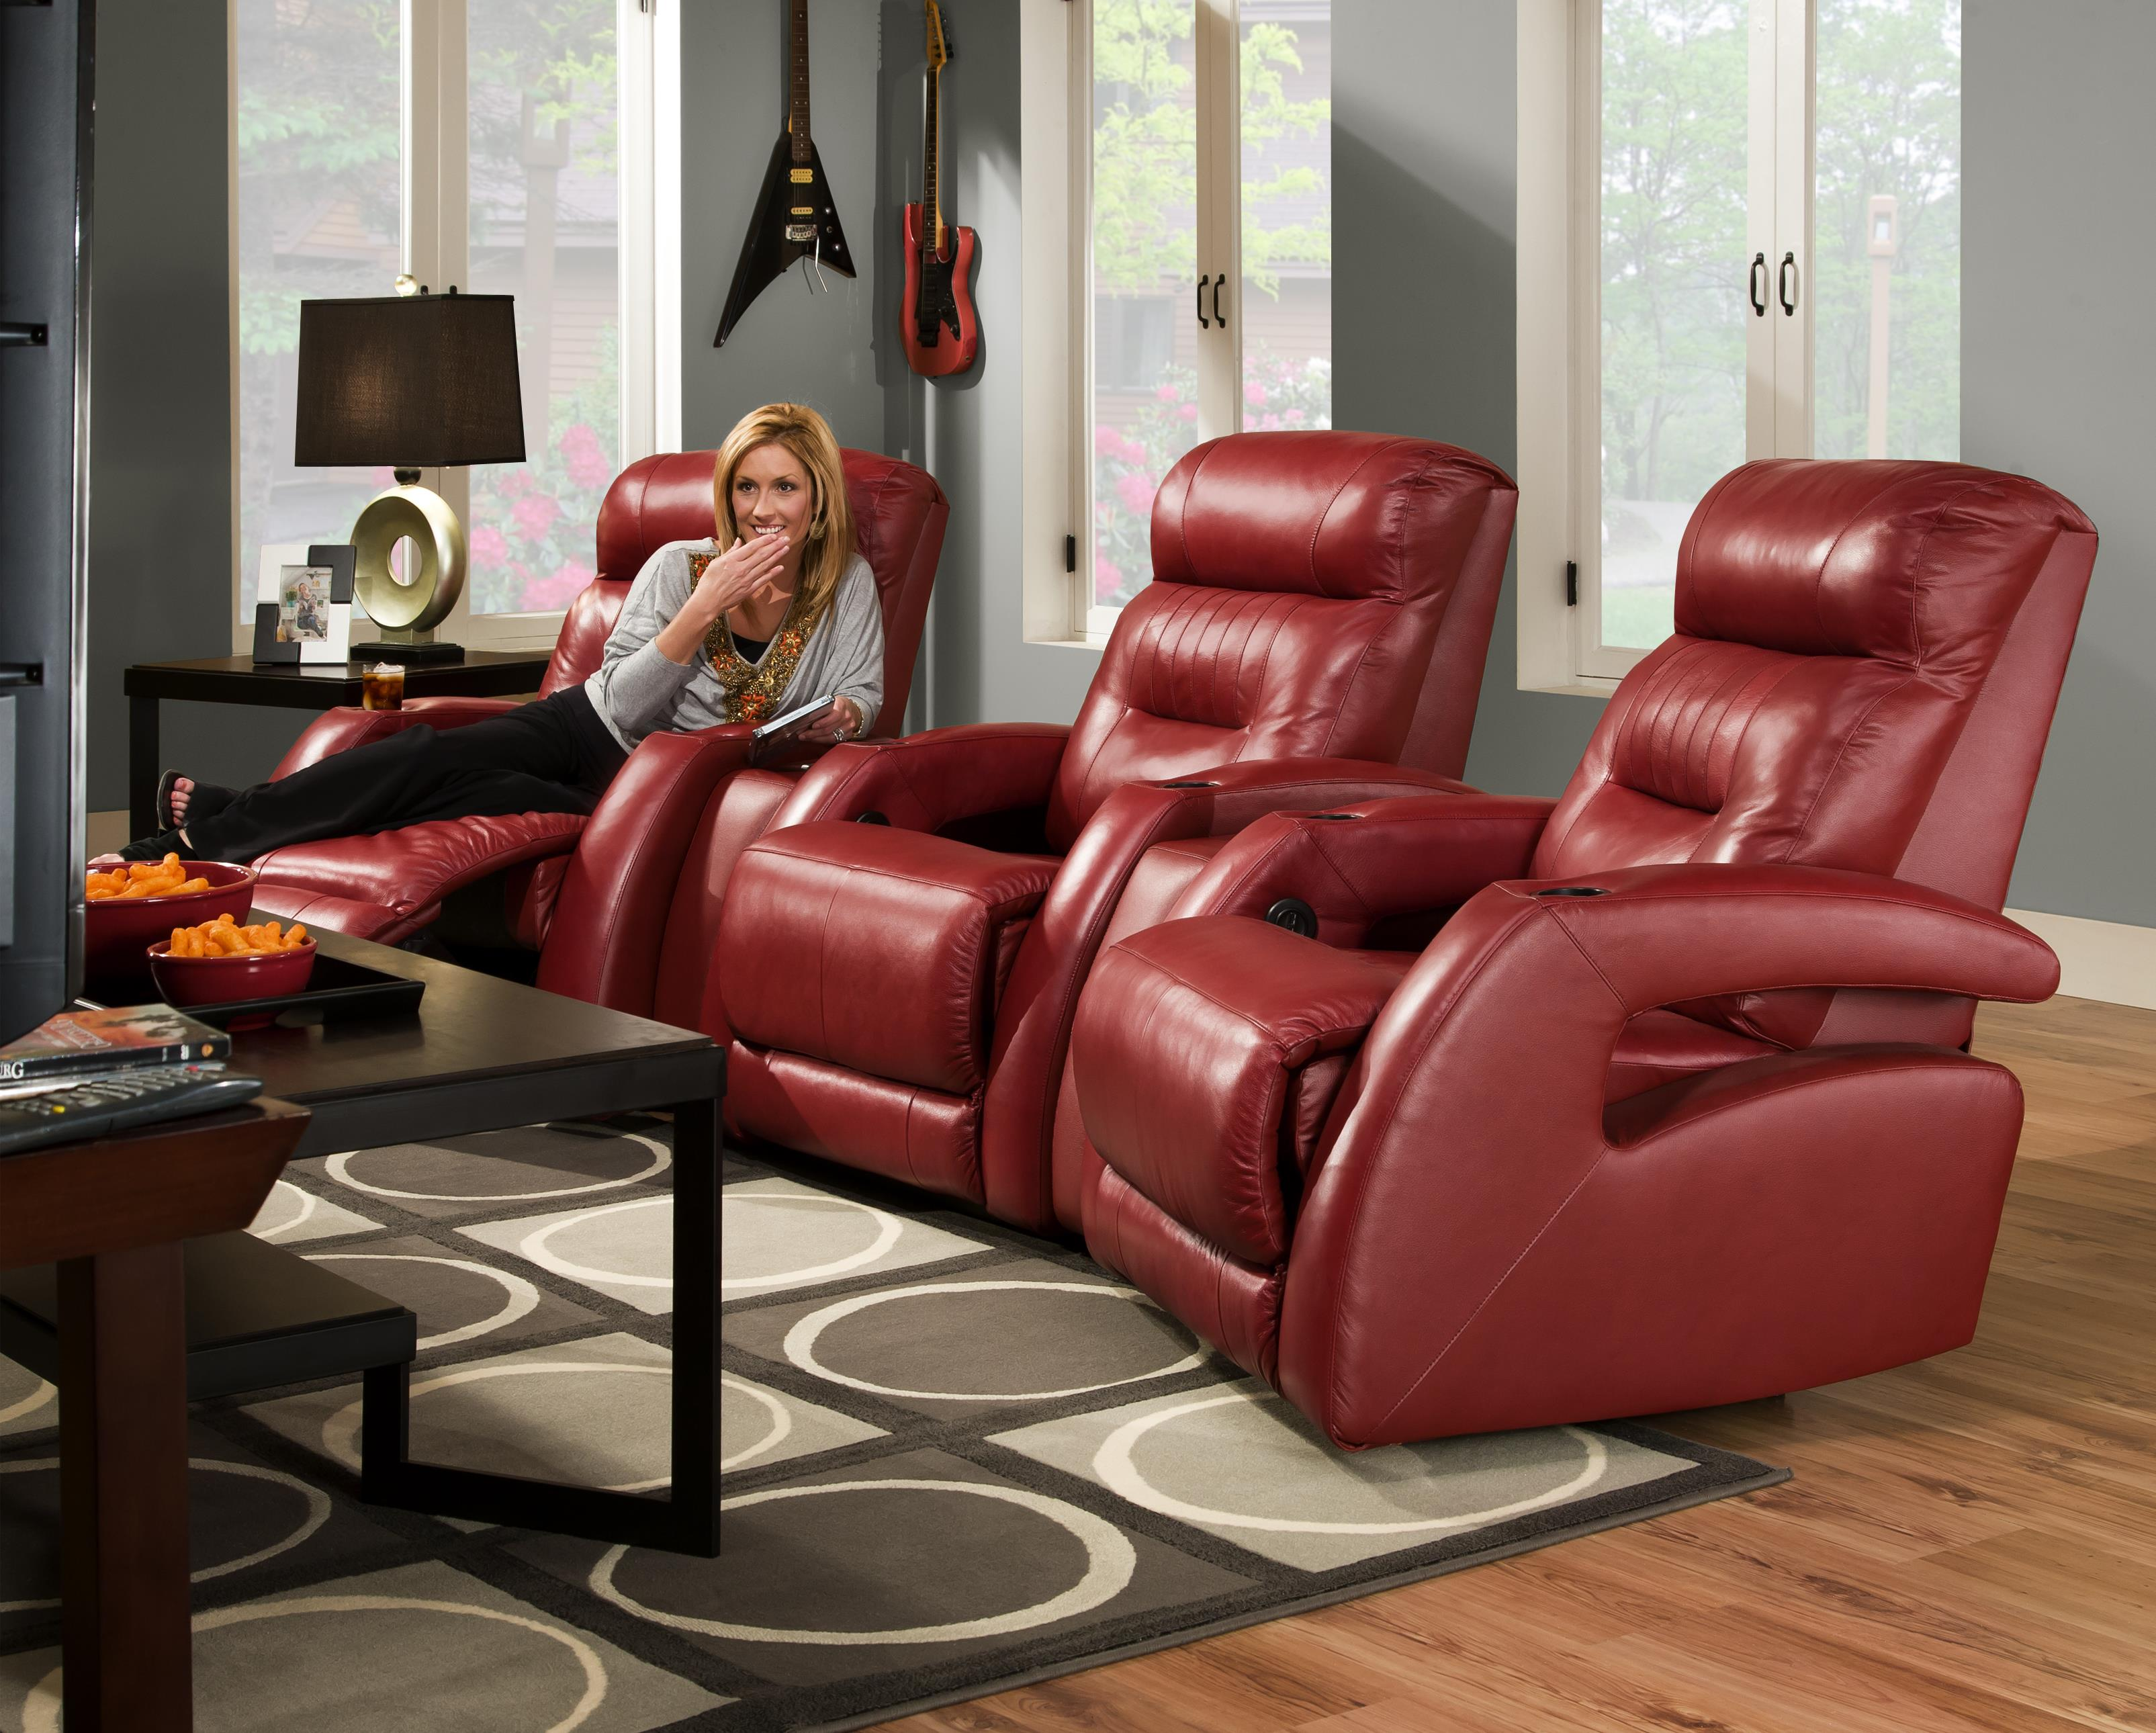 Viva (2577) By Southern Motion   Wayside Furniture   Southern Motion Viva  Dealer